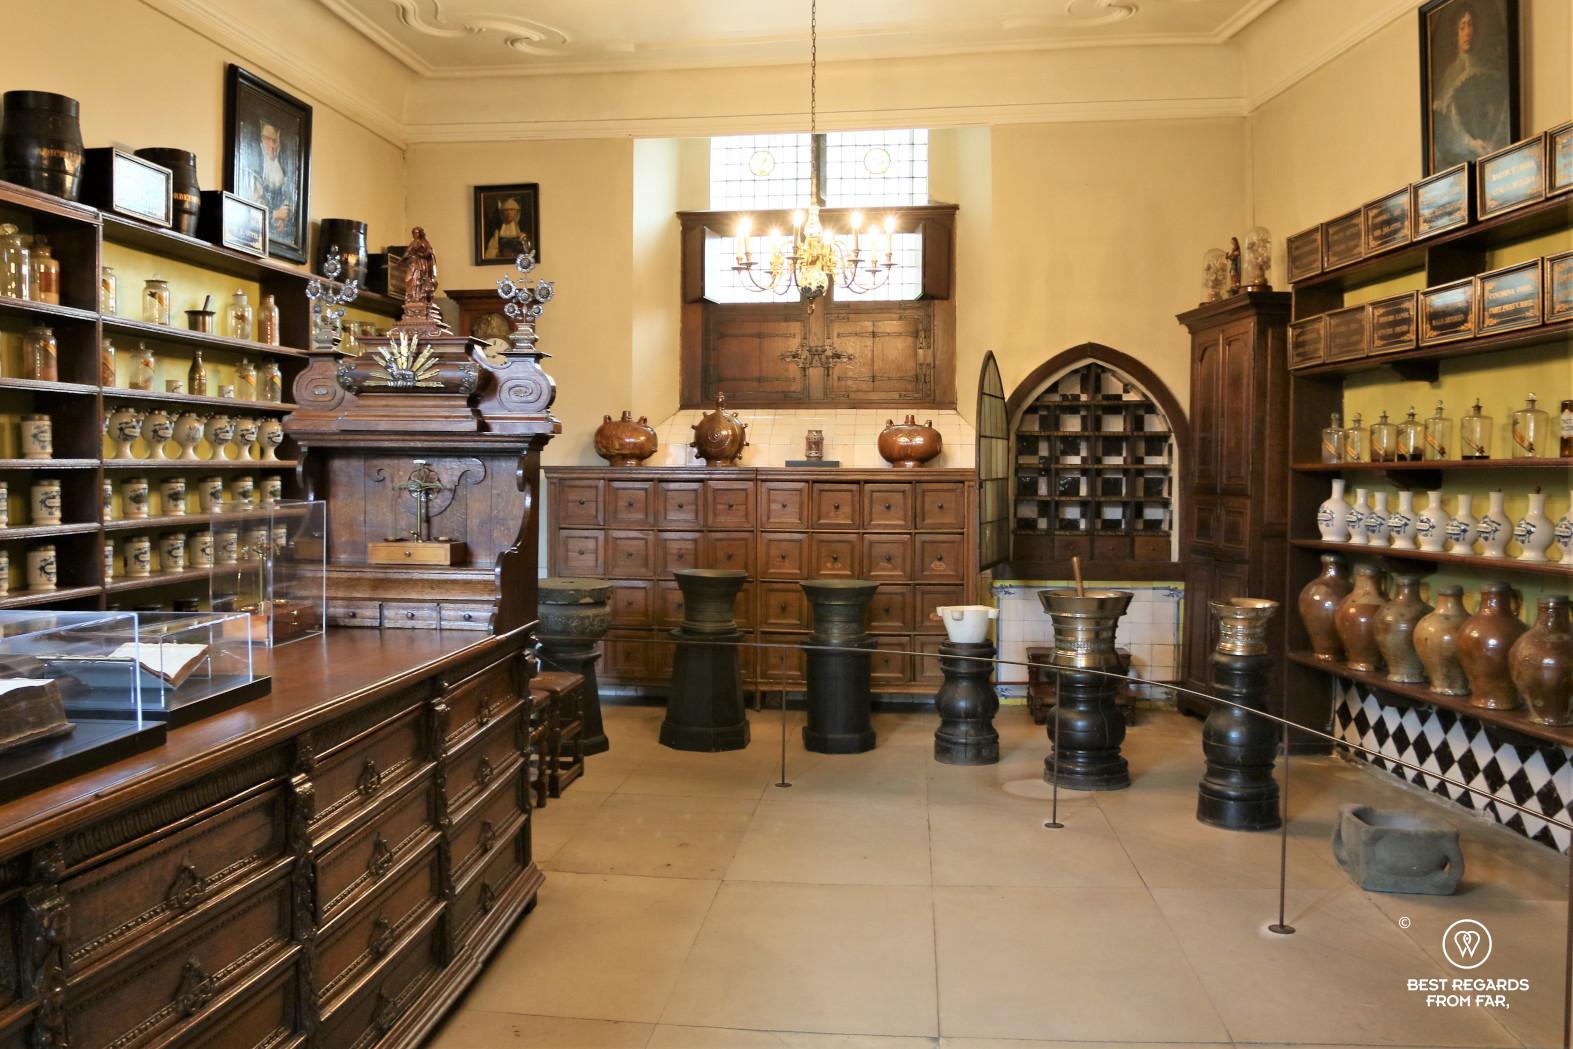 The pharmacy of the Saint John's Hospital, Bruges.